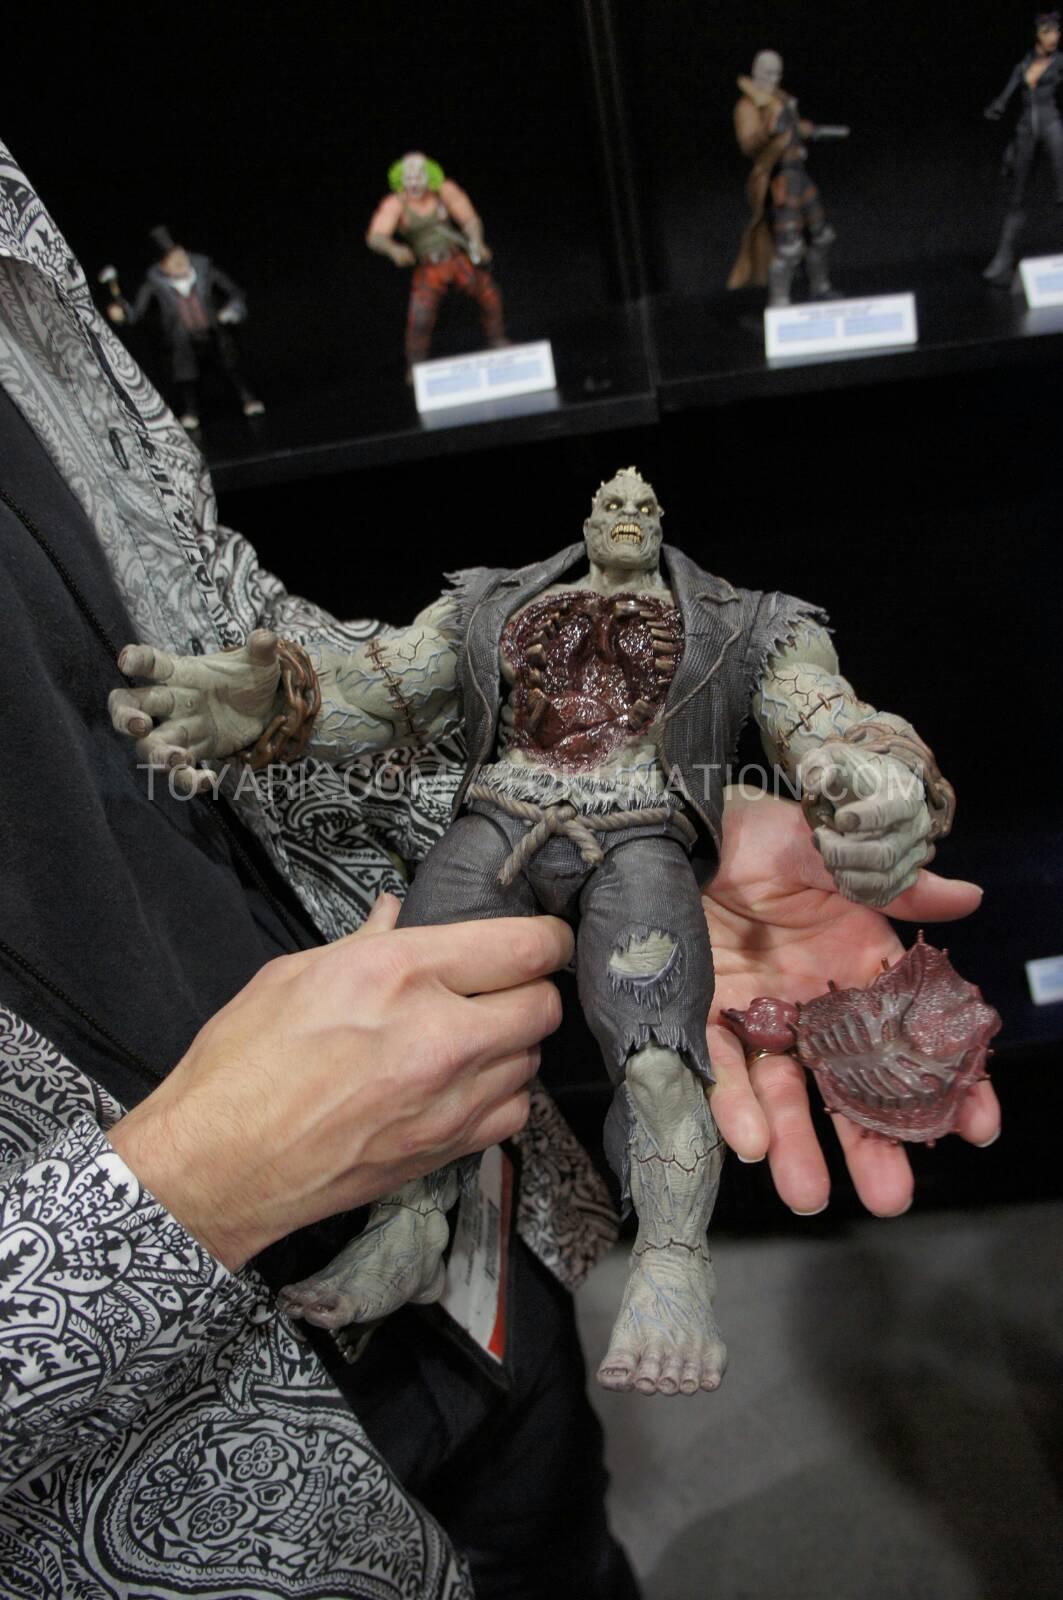 DC Collectibles Arkham City Solomon Grundy Deluxe Action Figure Toy Fair 2013